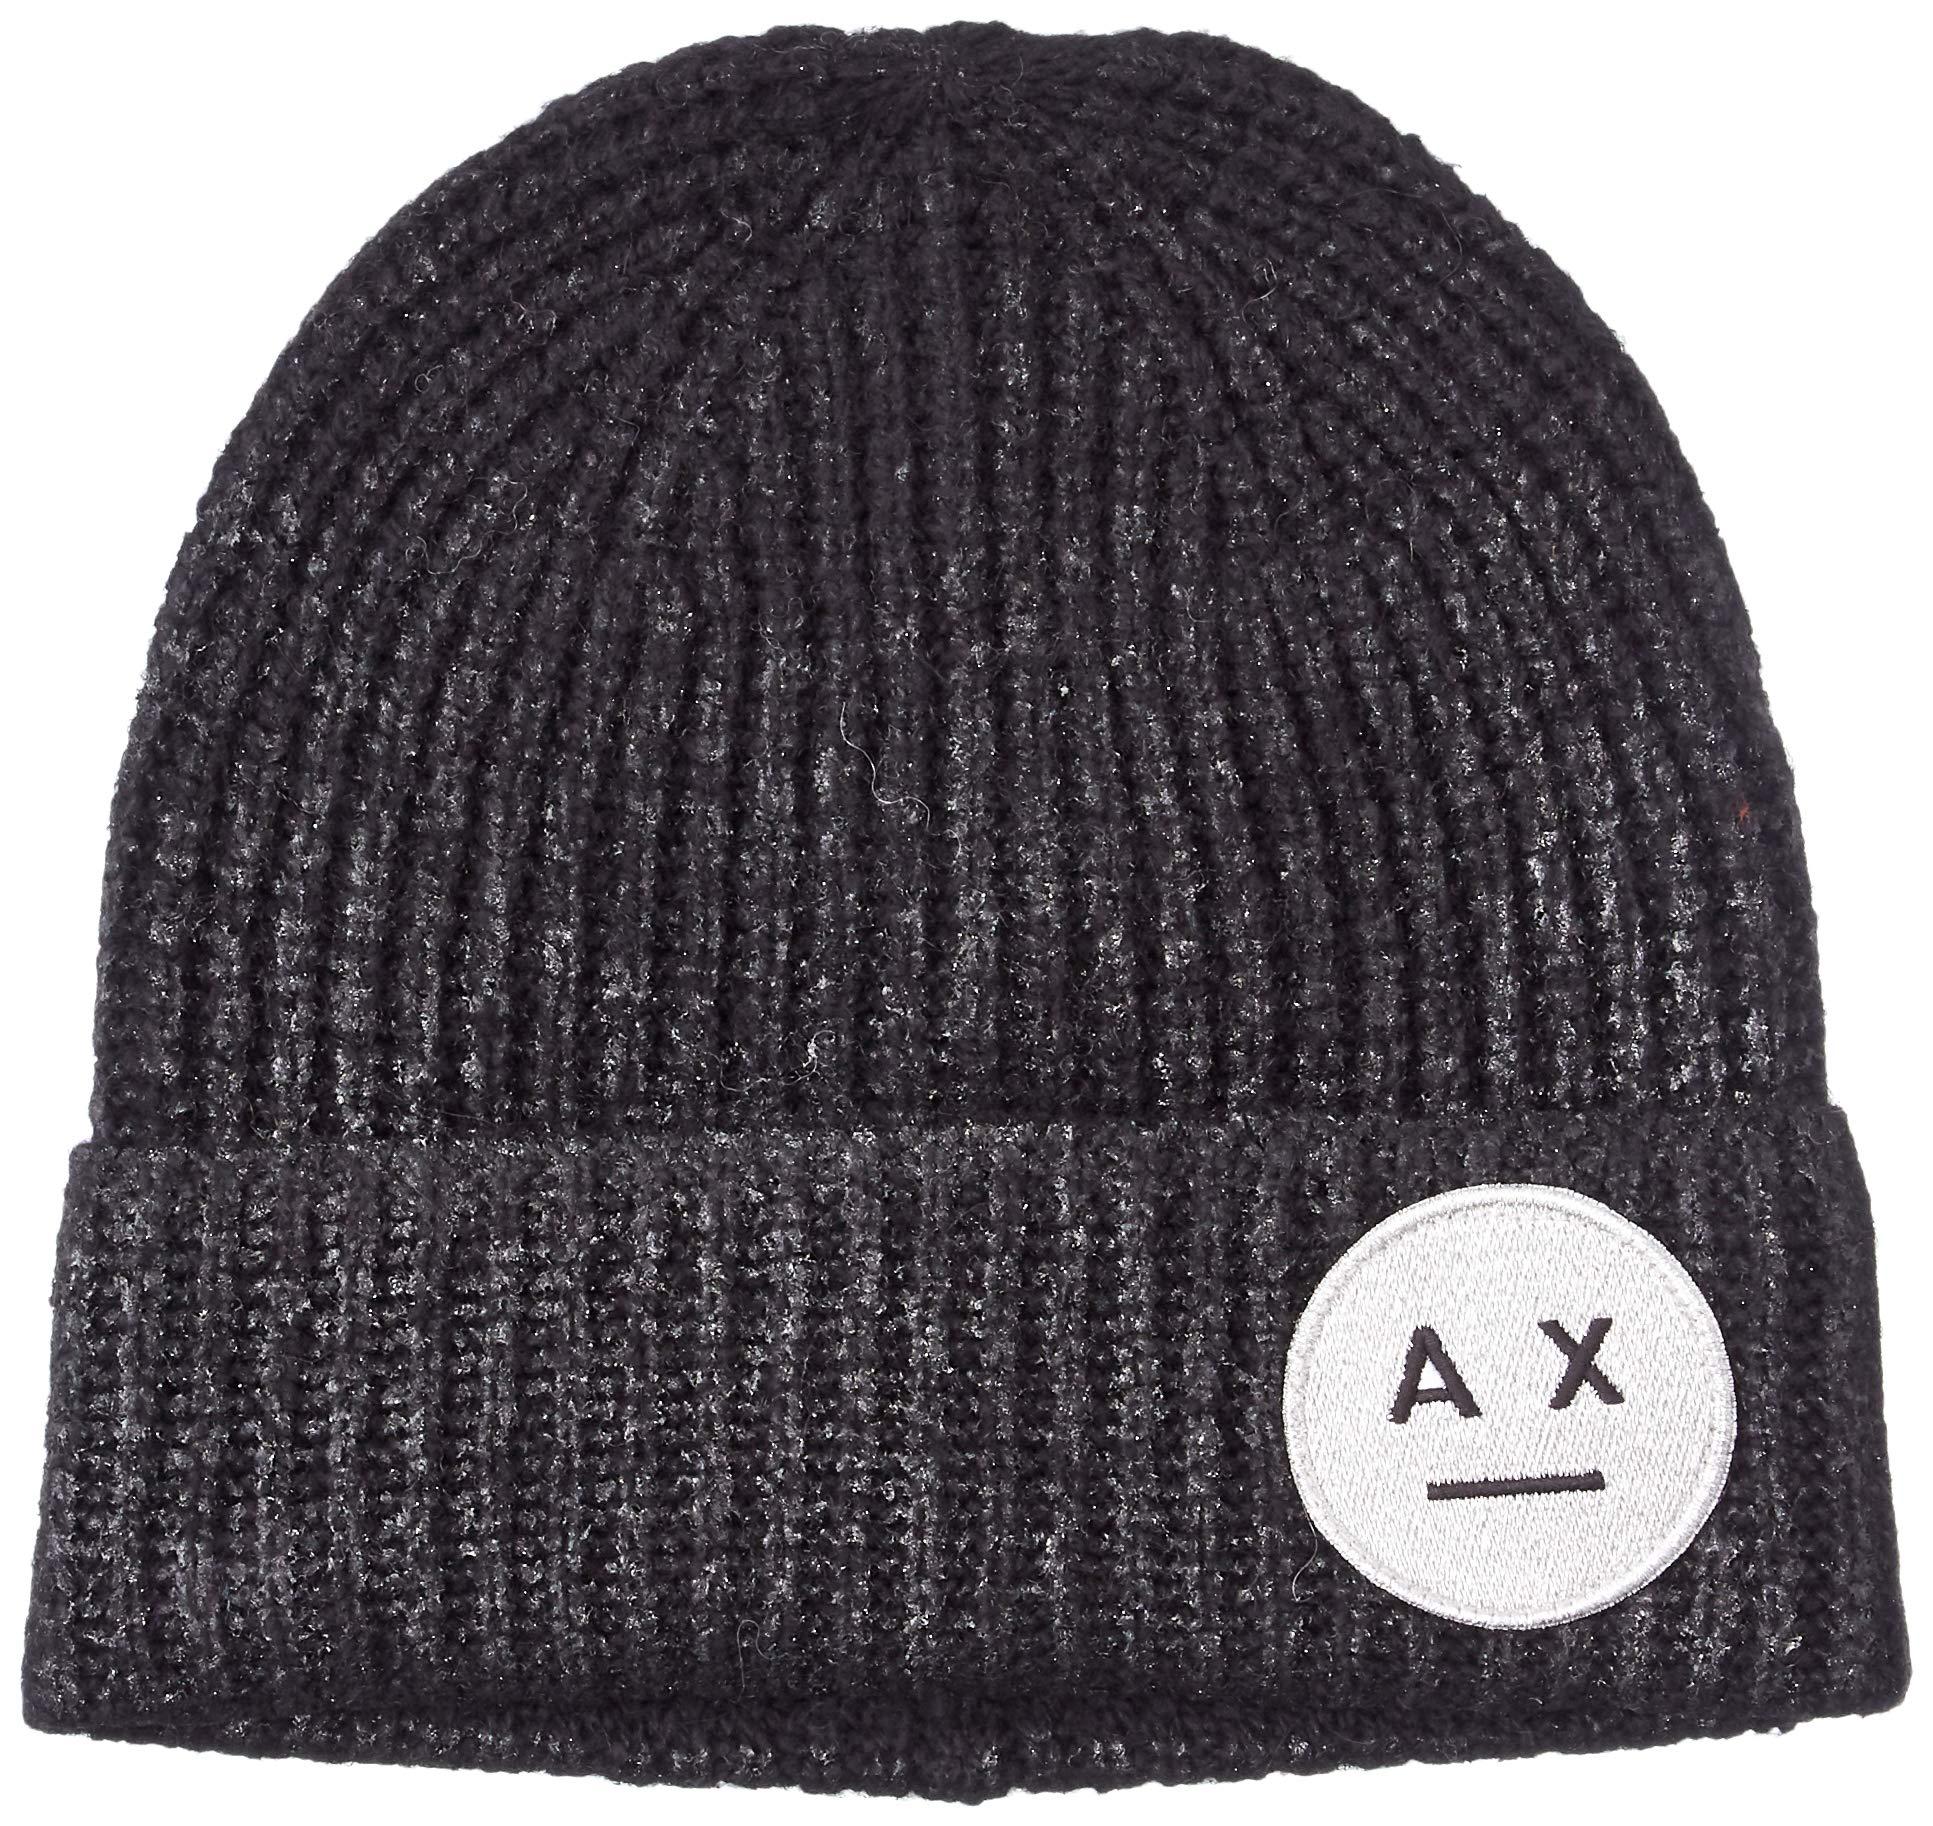 A|X Armani Exchange Women's Smile Logo Beanie, Black/dyecoated DTM Medium, TU